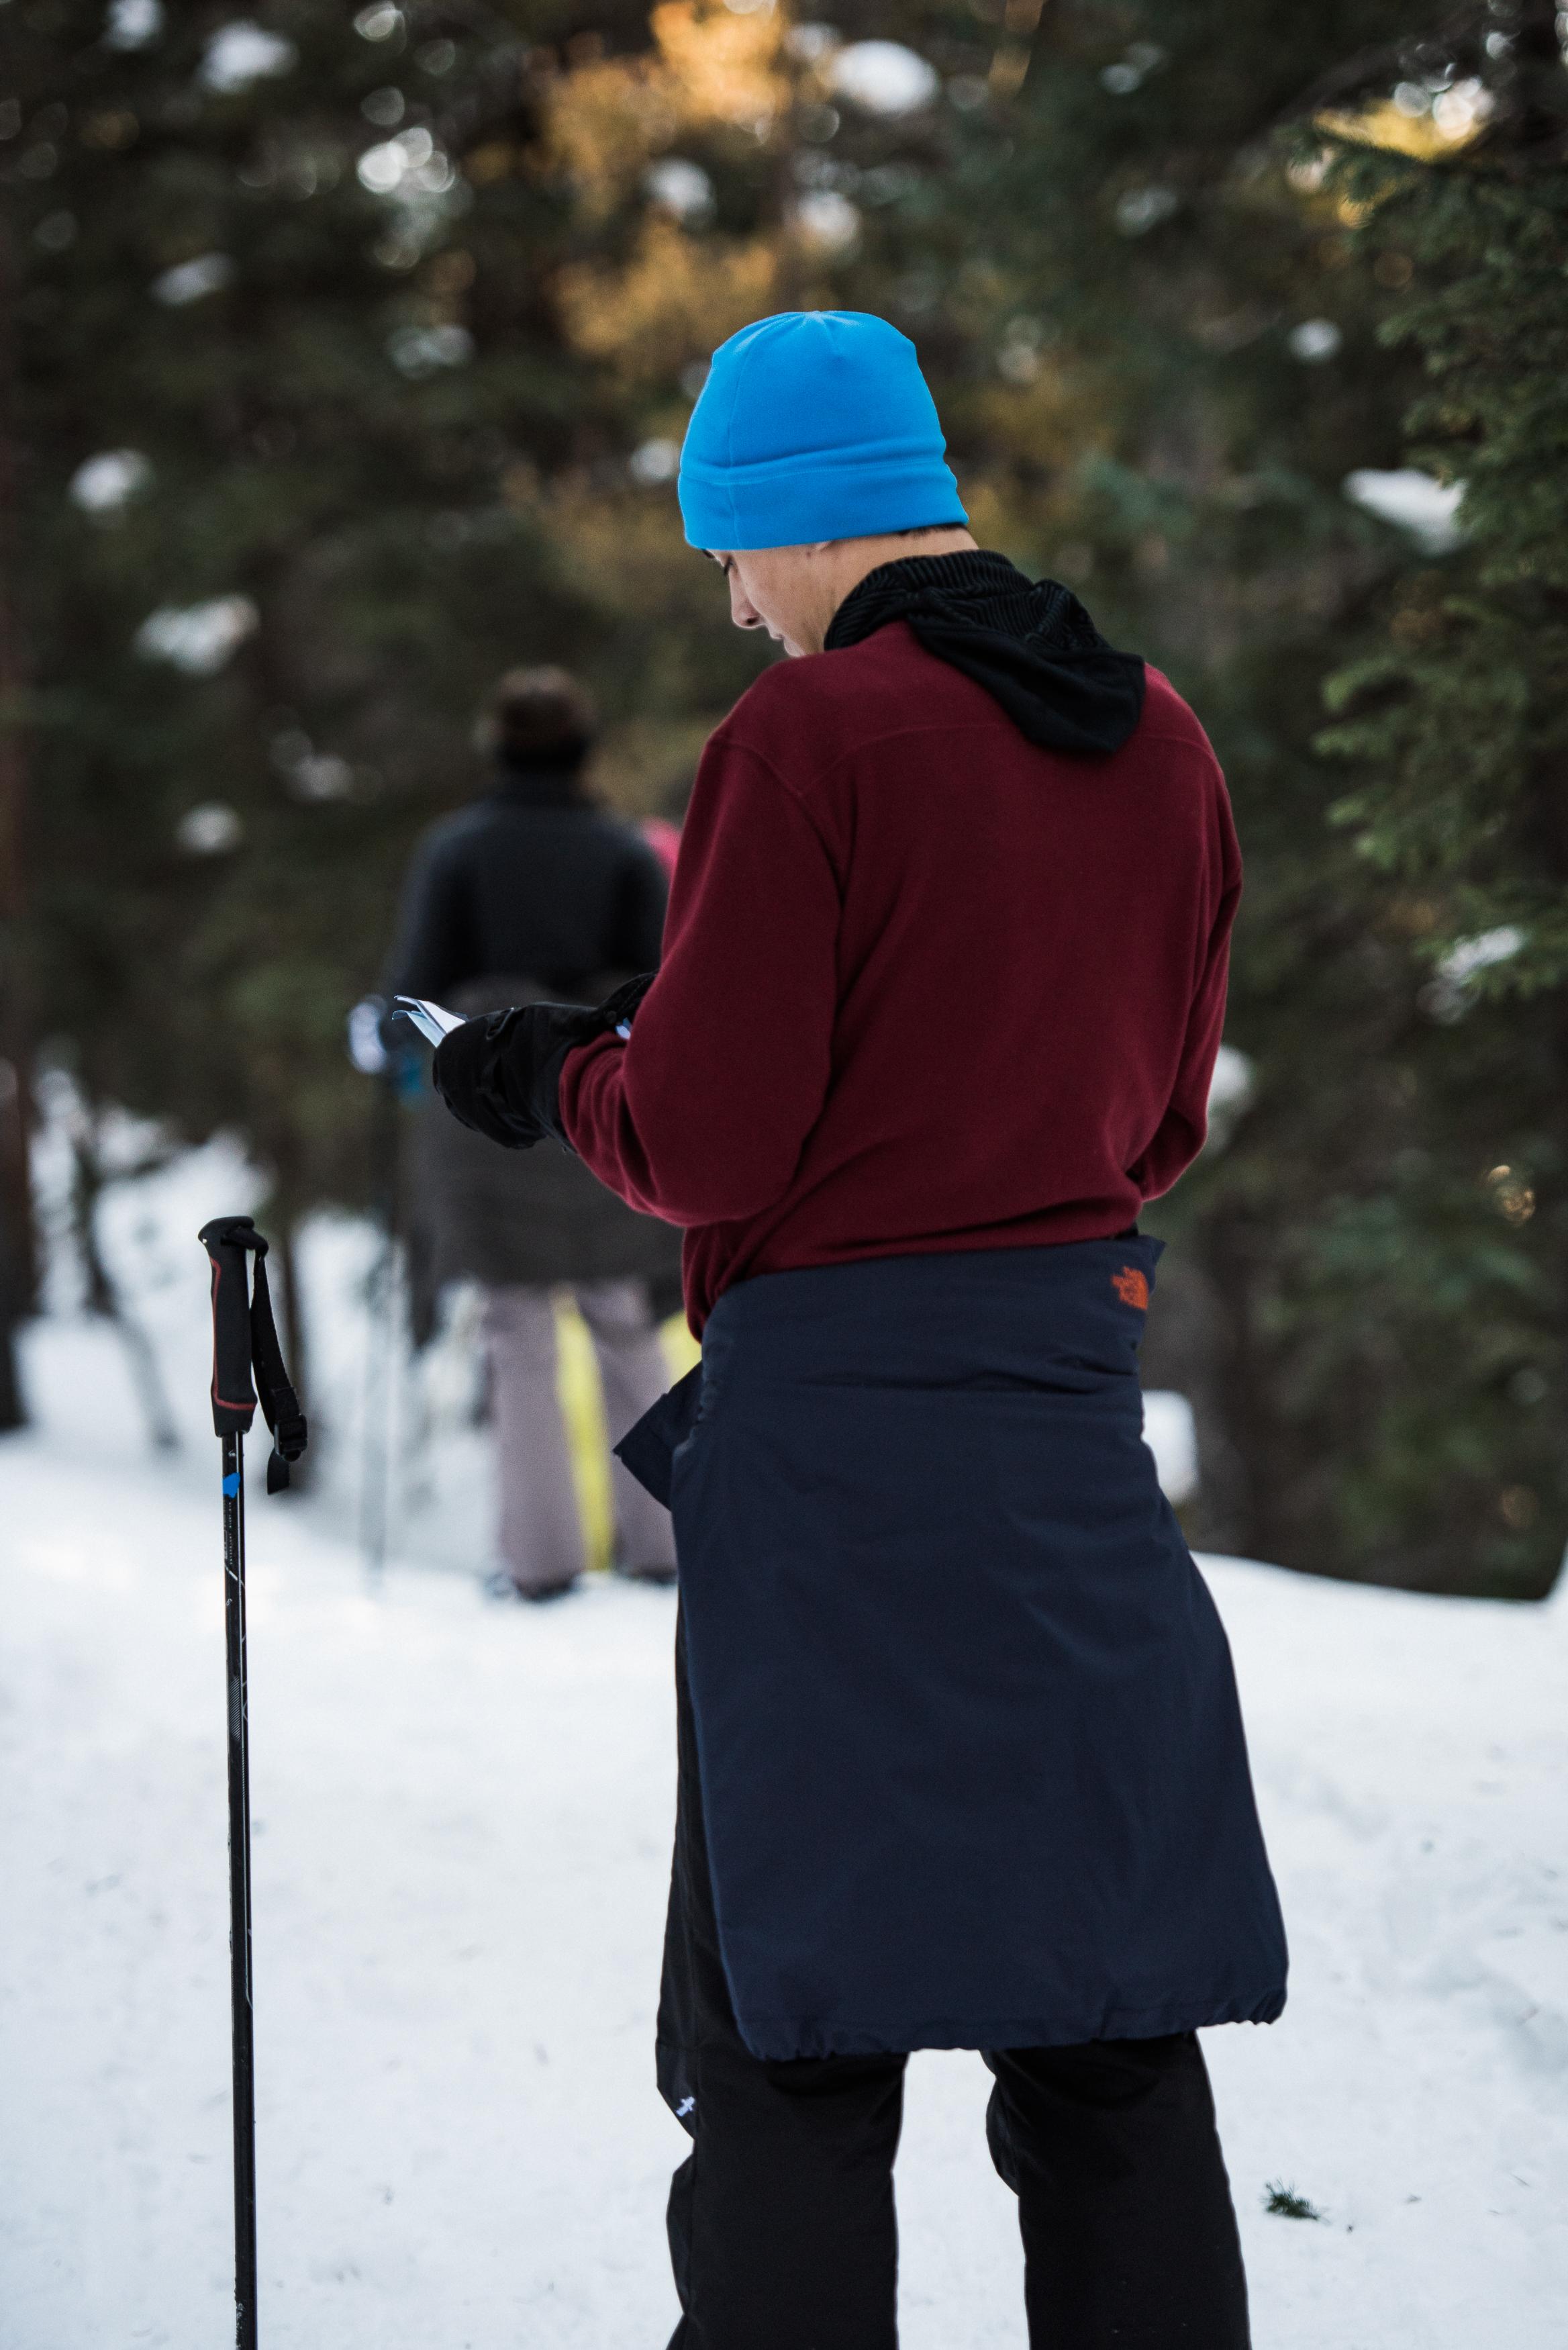 TaraShupe_Outdoor_Photographer_Loweprobags_Colorado_Copper_Mountains_Ski_89.jpg